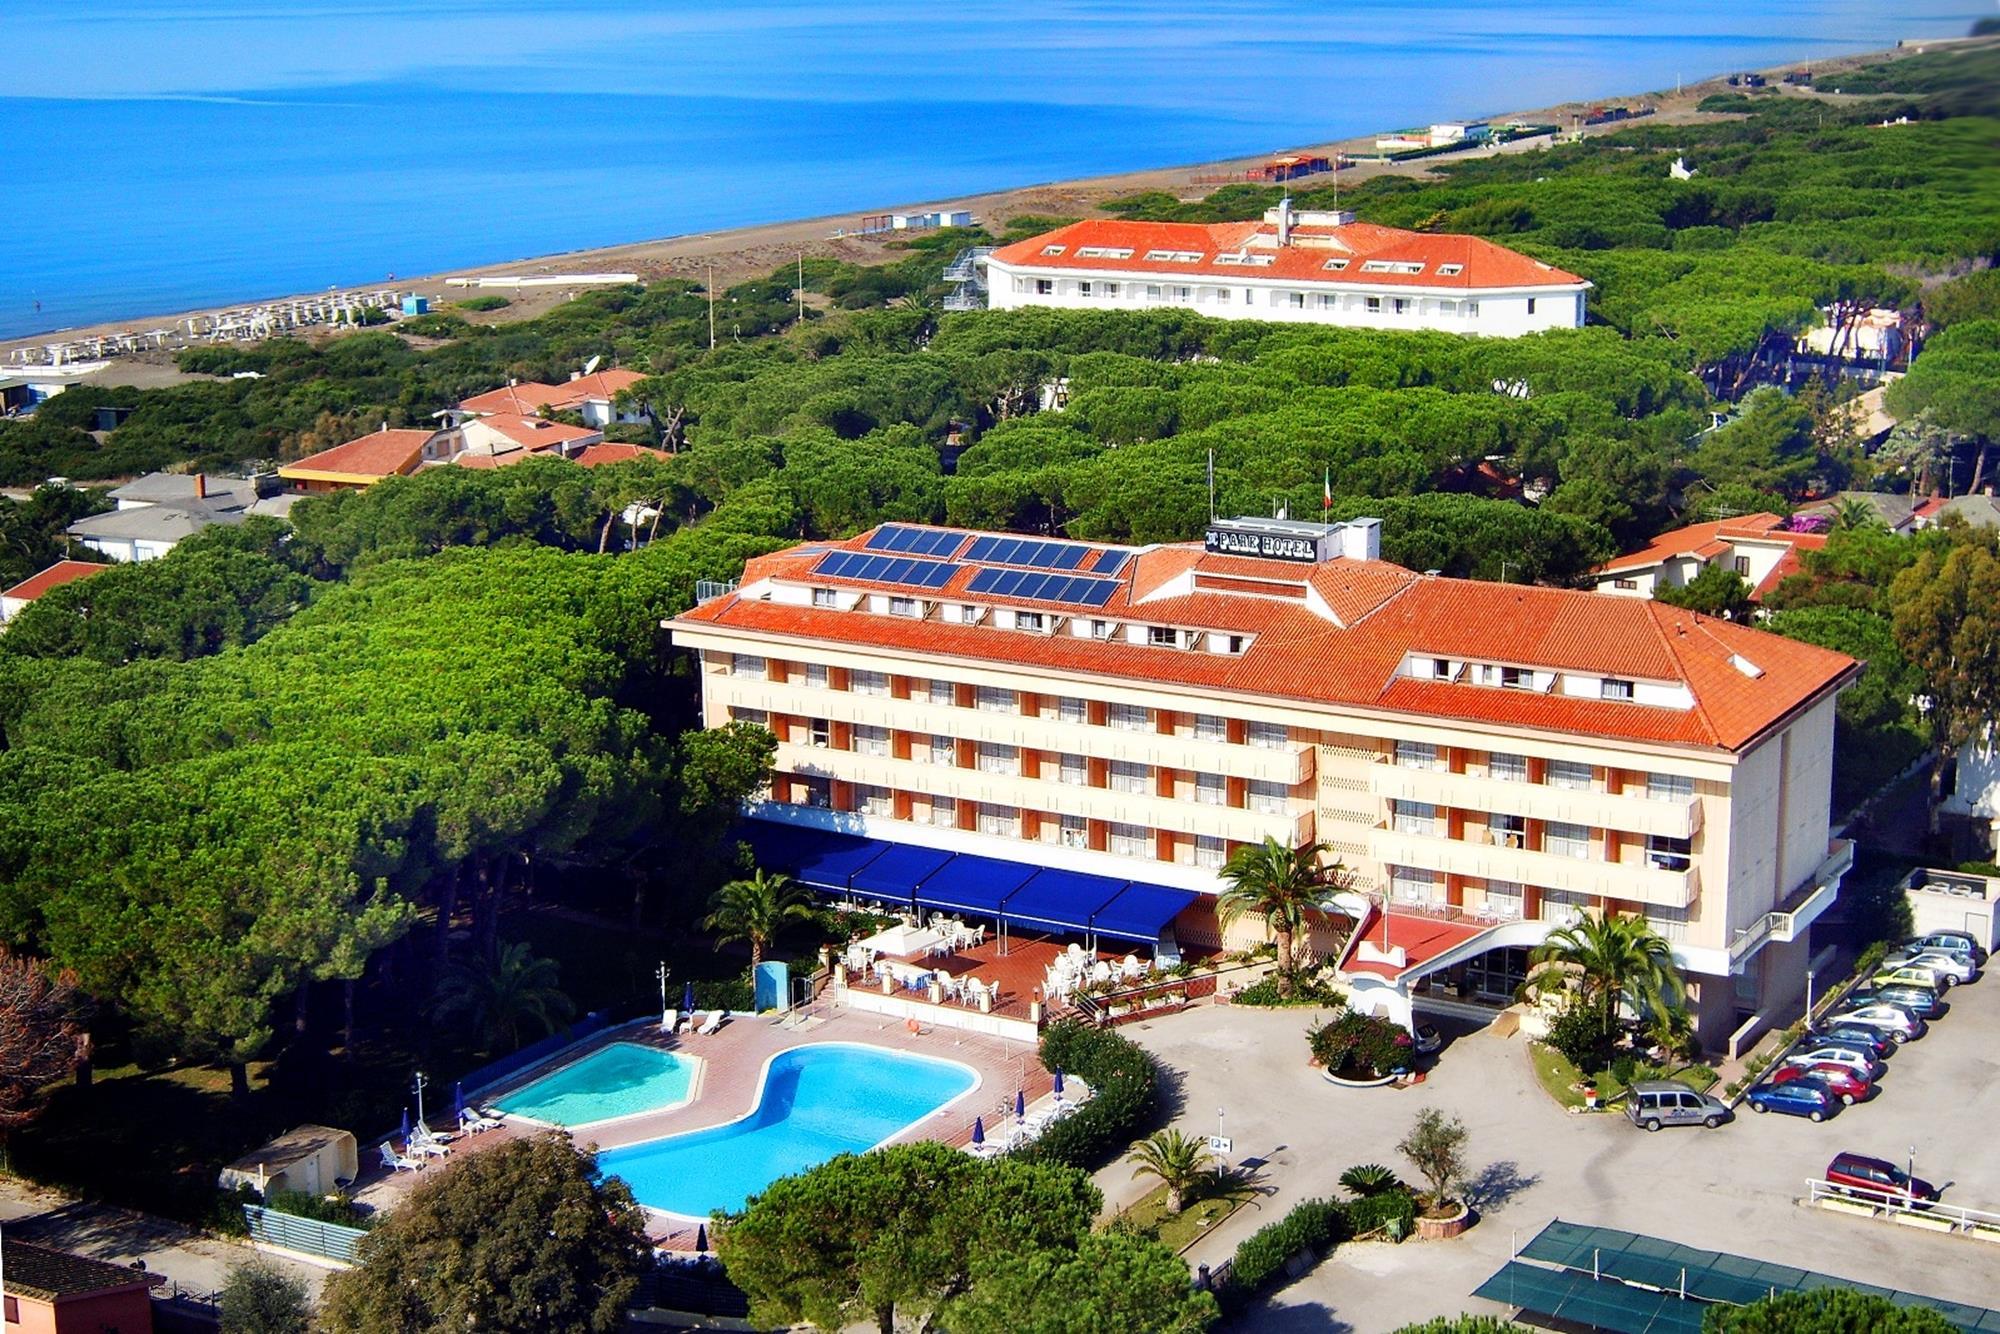 Hotel Park - Baia Domizia***